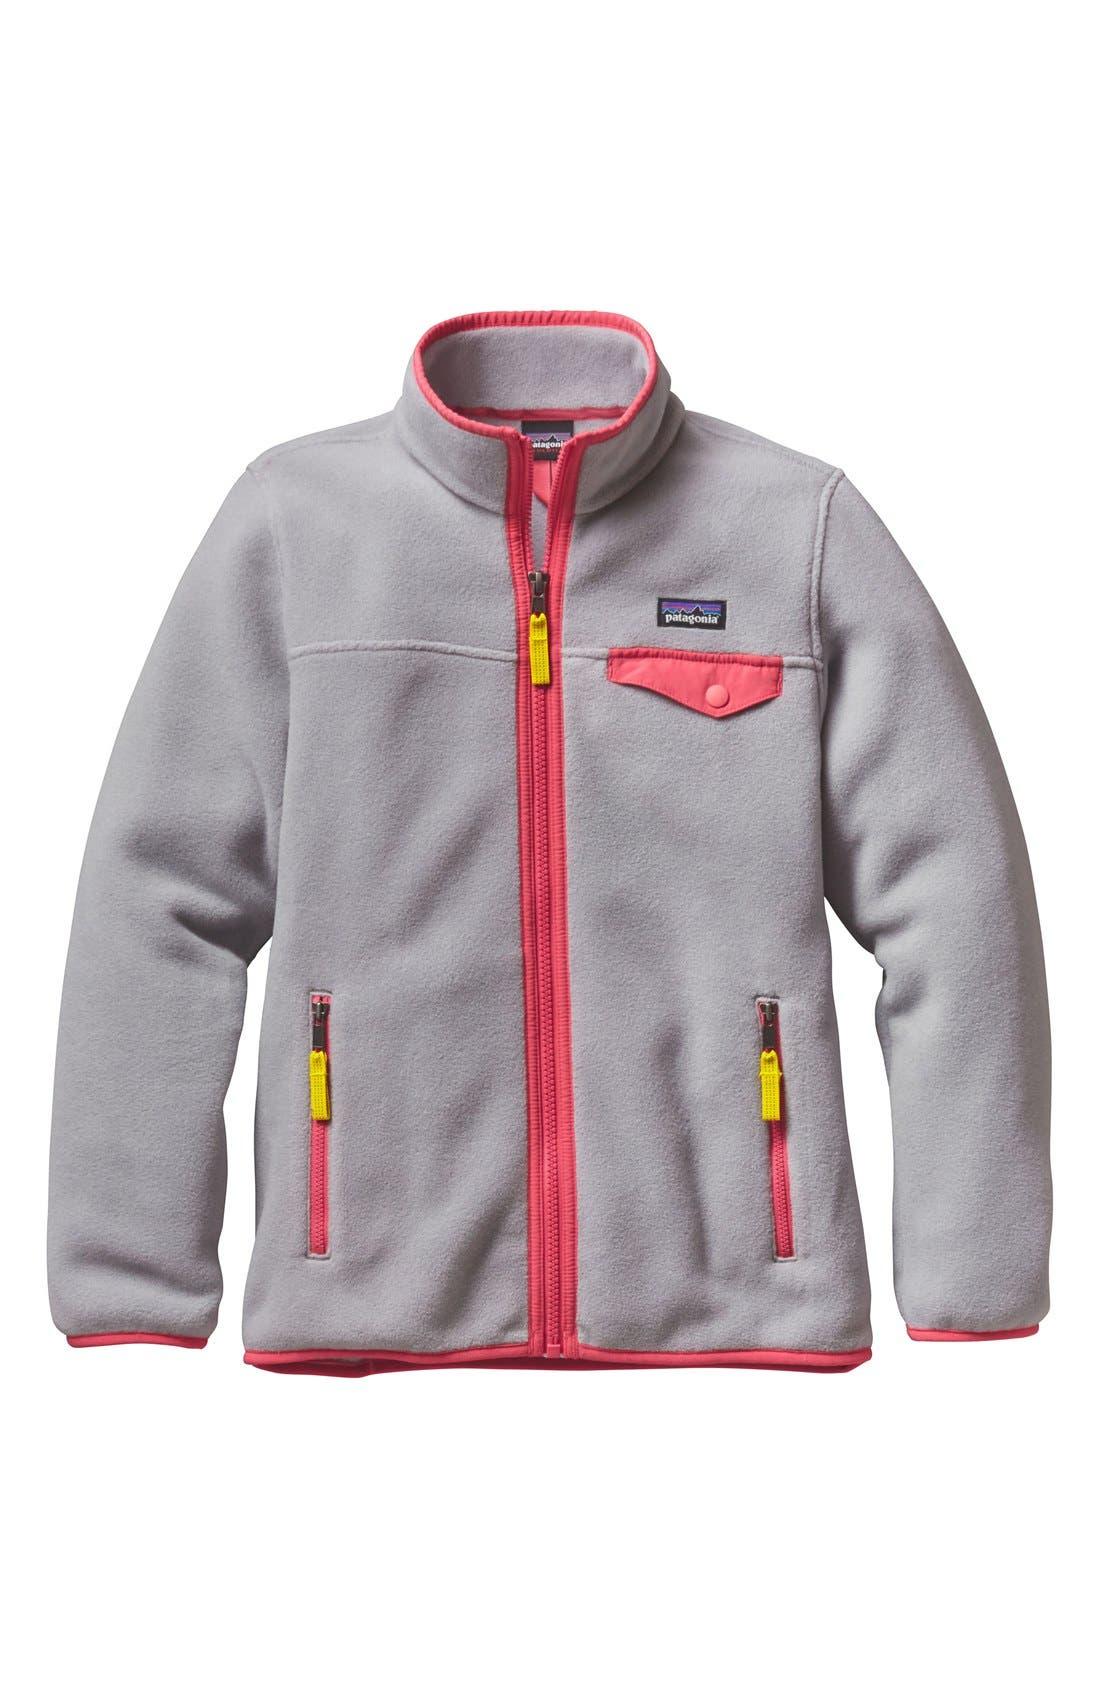 Synchilla<sup>®</sup> Snap-T<sup>®</sup> Fleece Jacket,                             Main thumbnail 3, color,